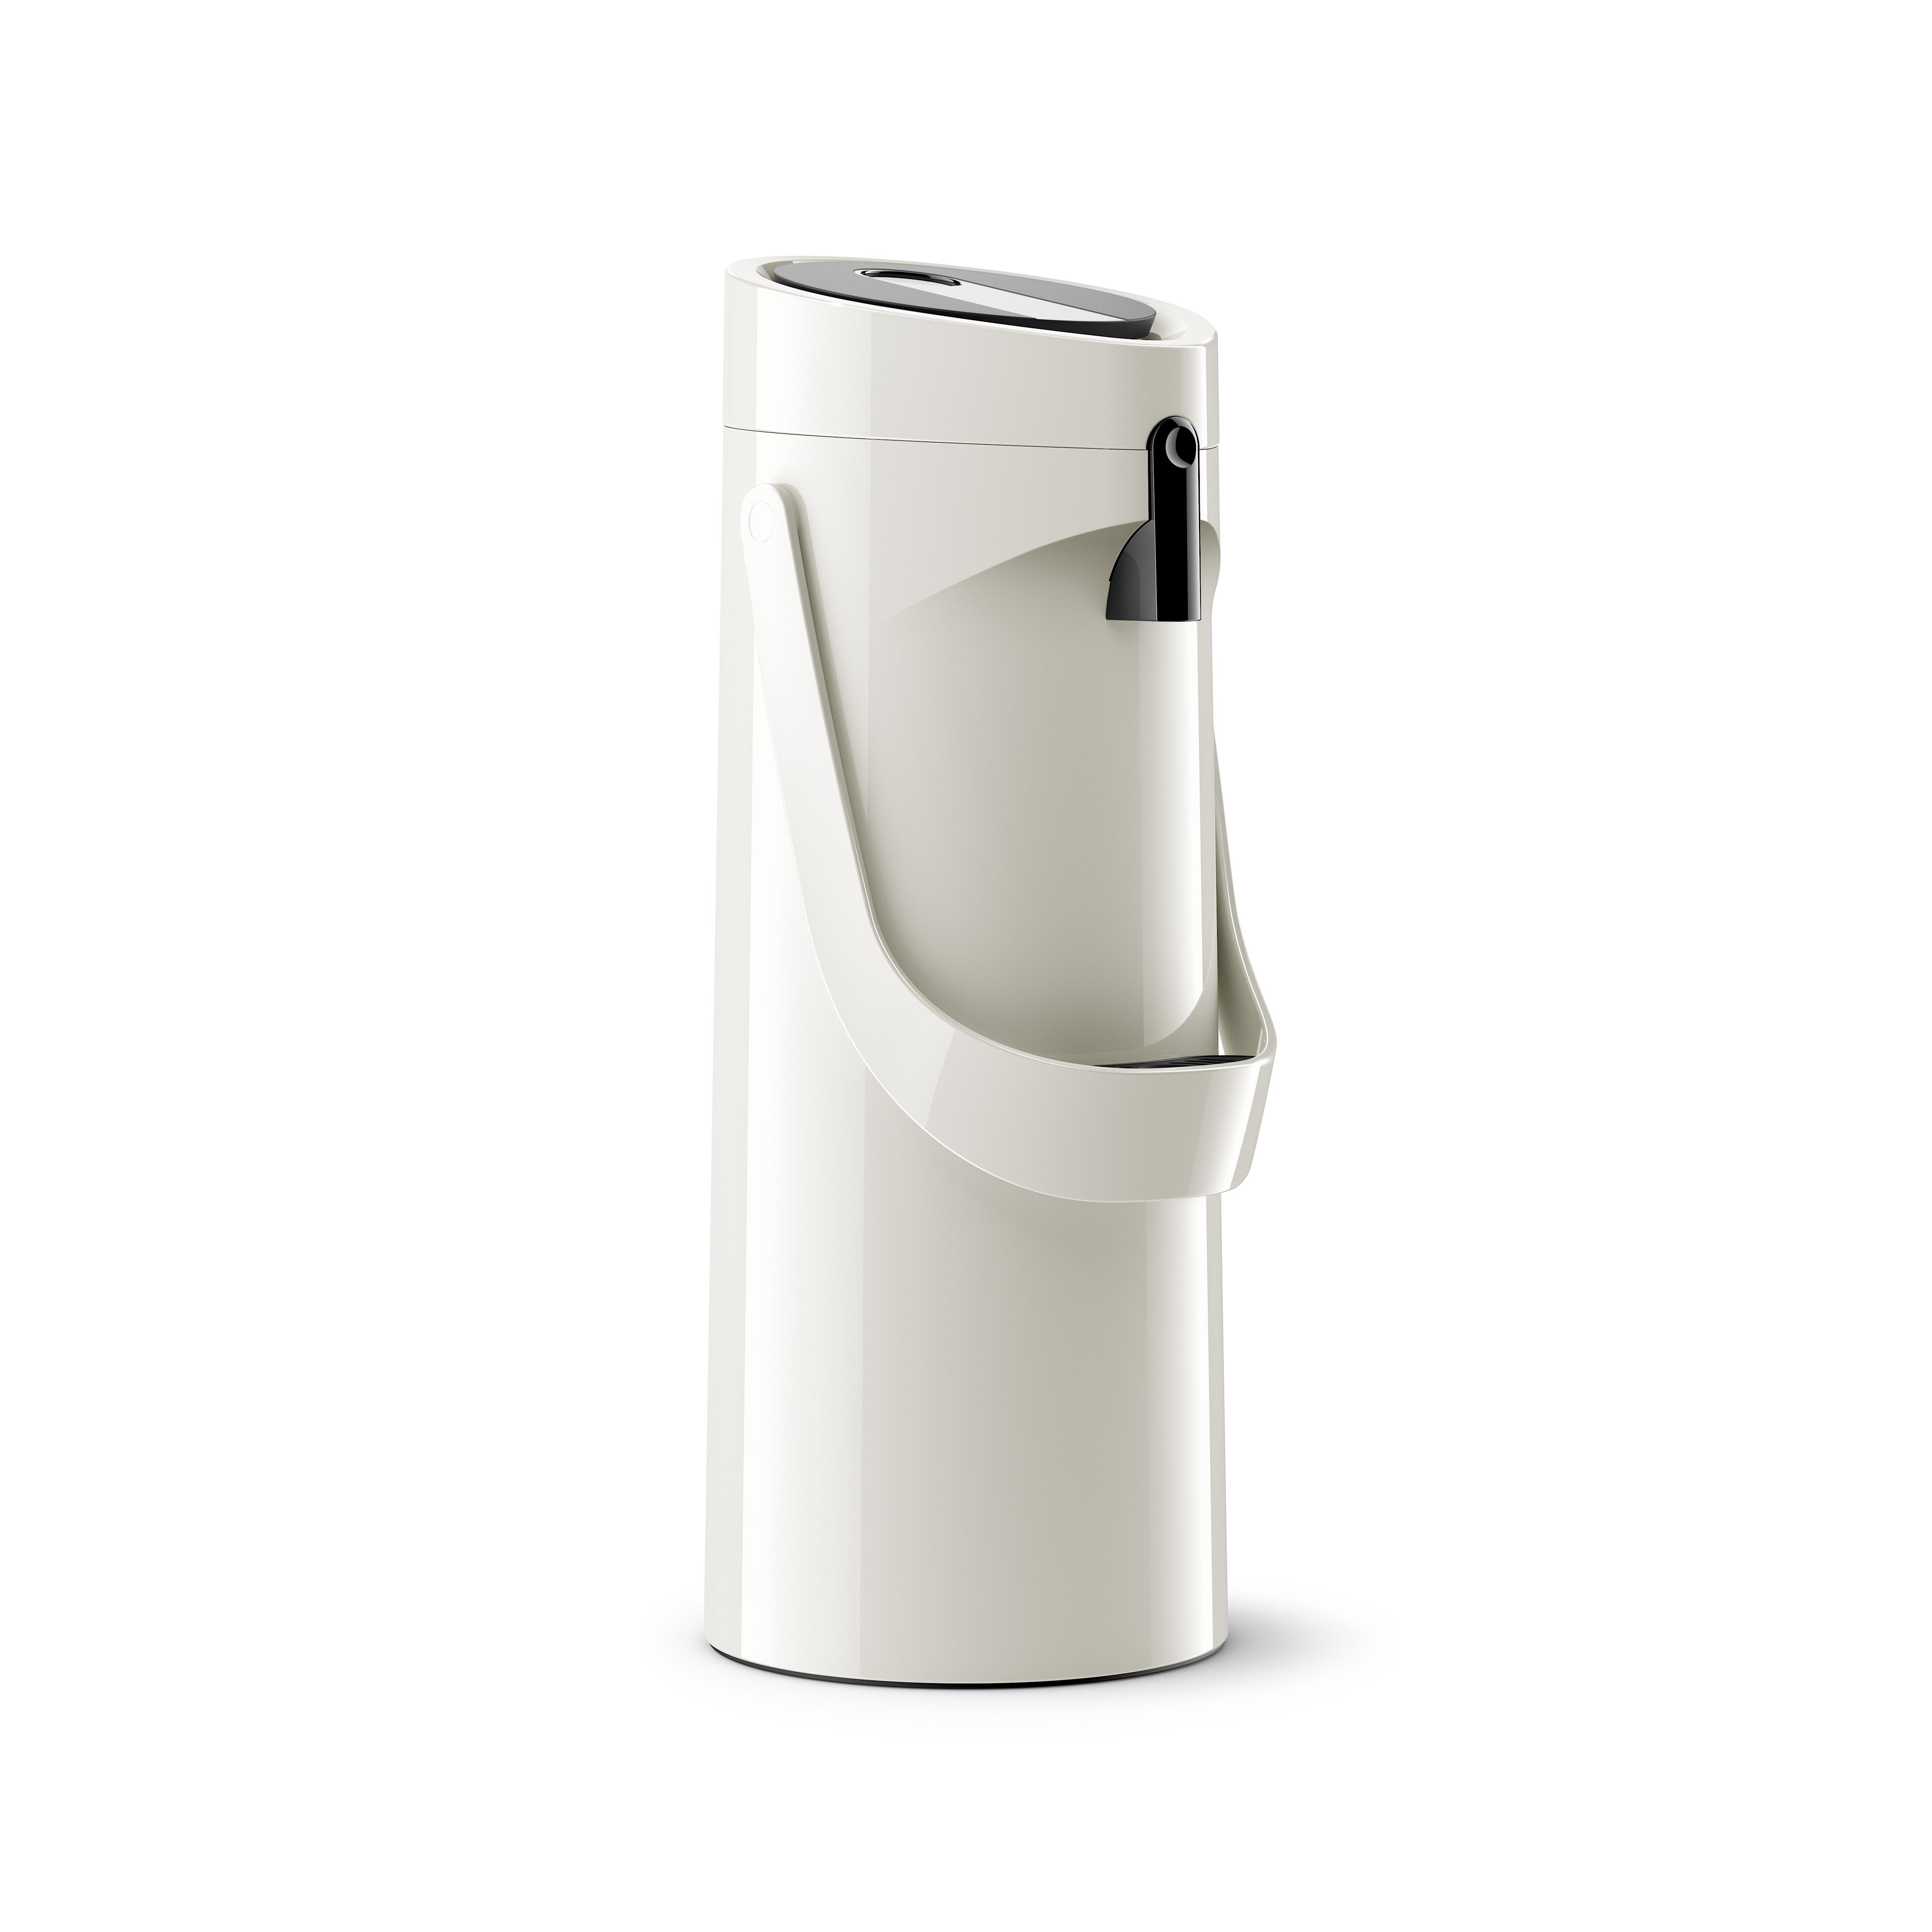 515707 EMSA PONZA Pump-Isolierkanne 1,9 L Weiß